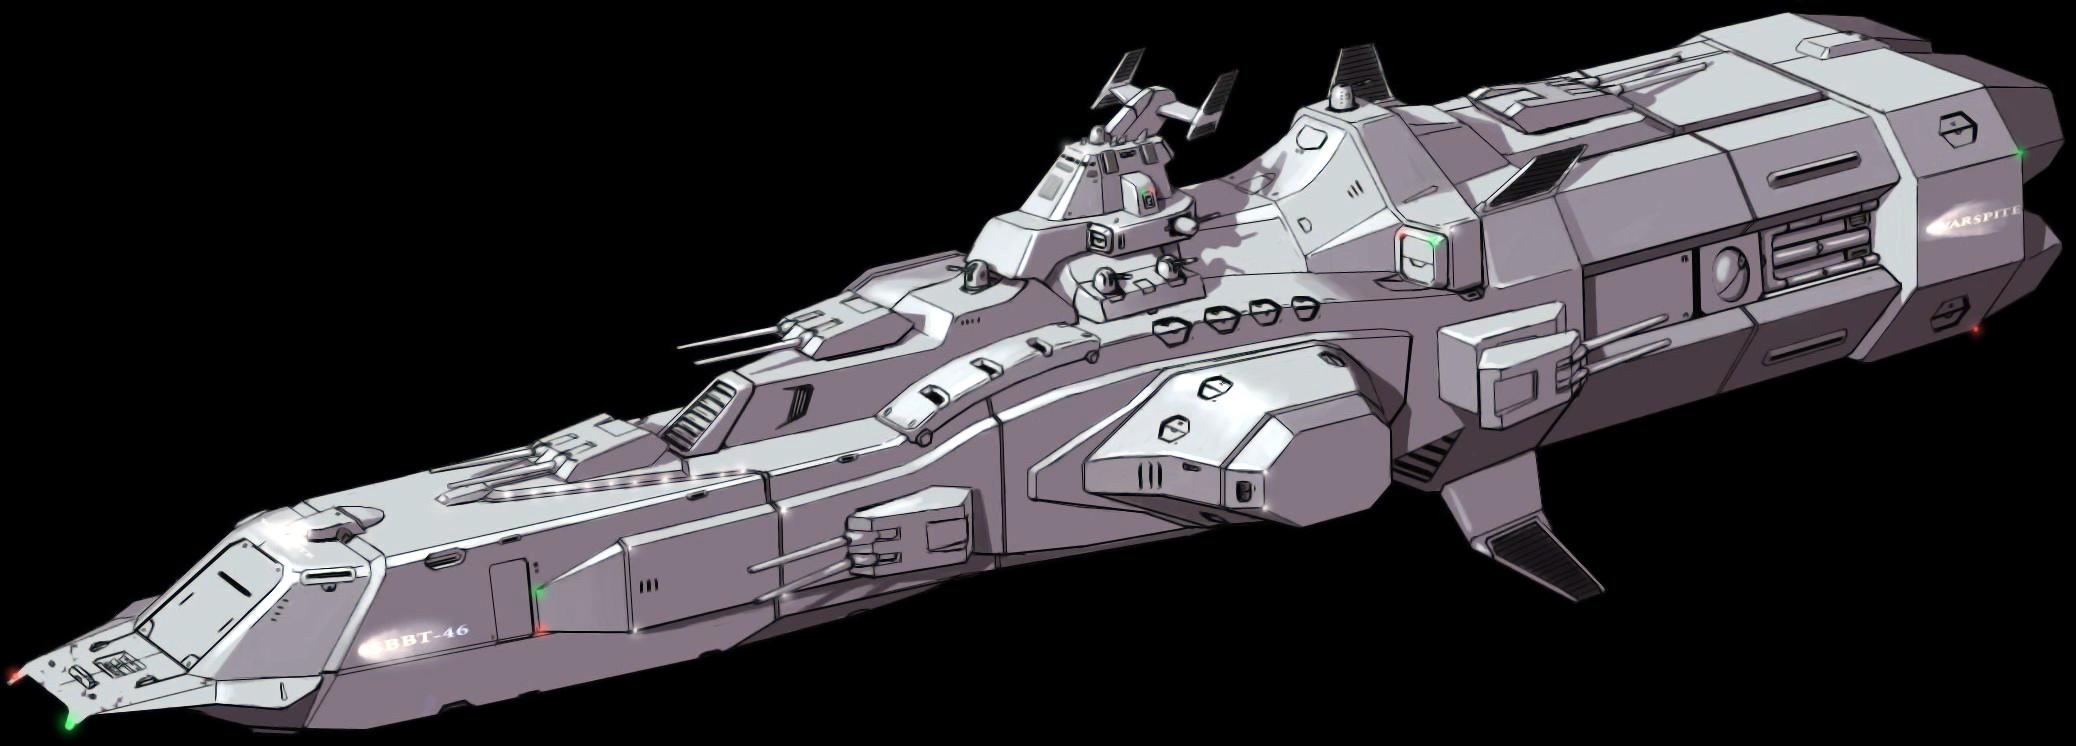 Warspite_Cruiser.jpg